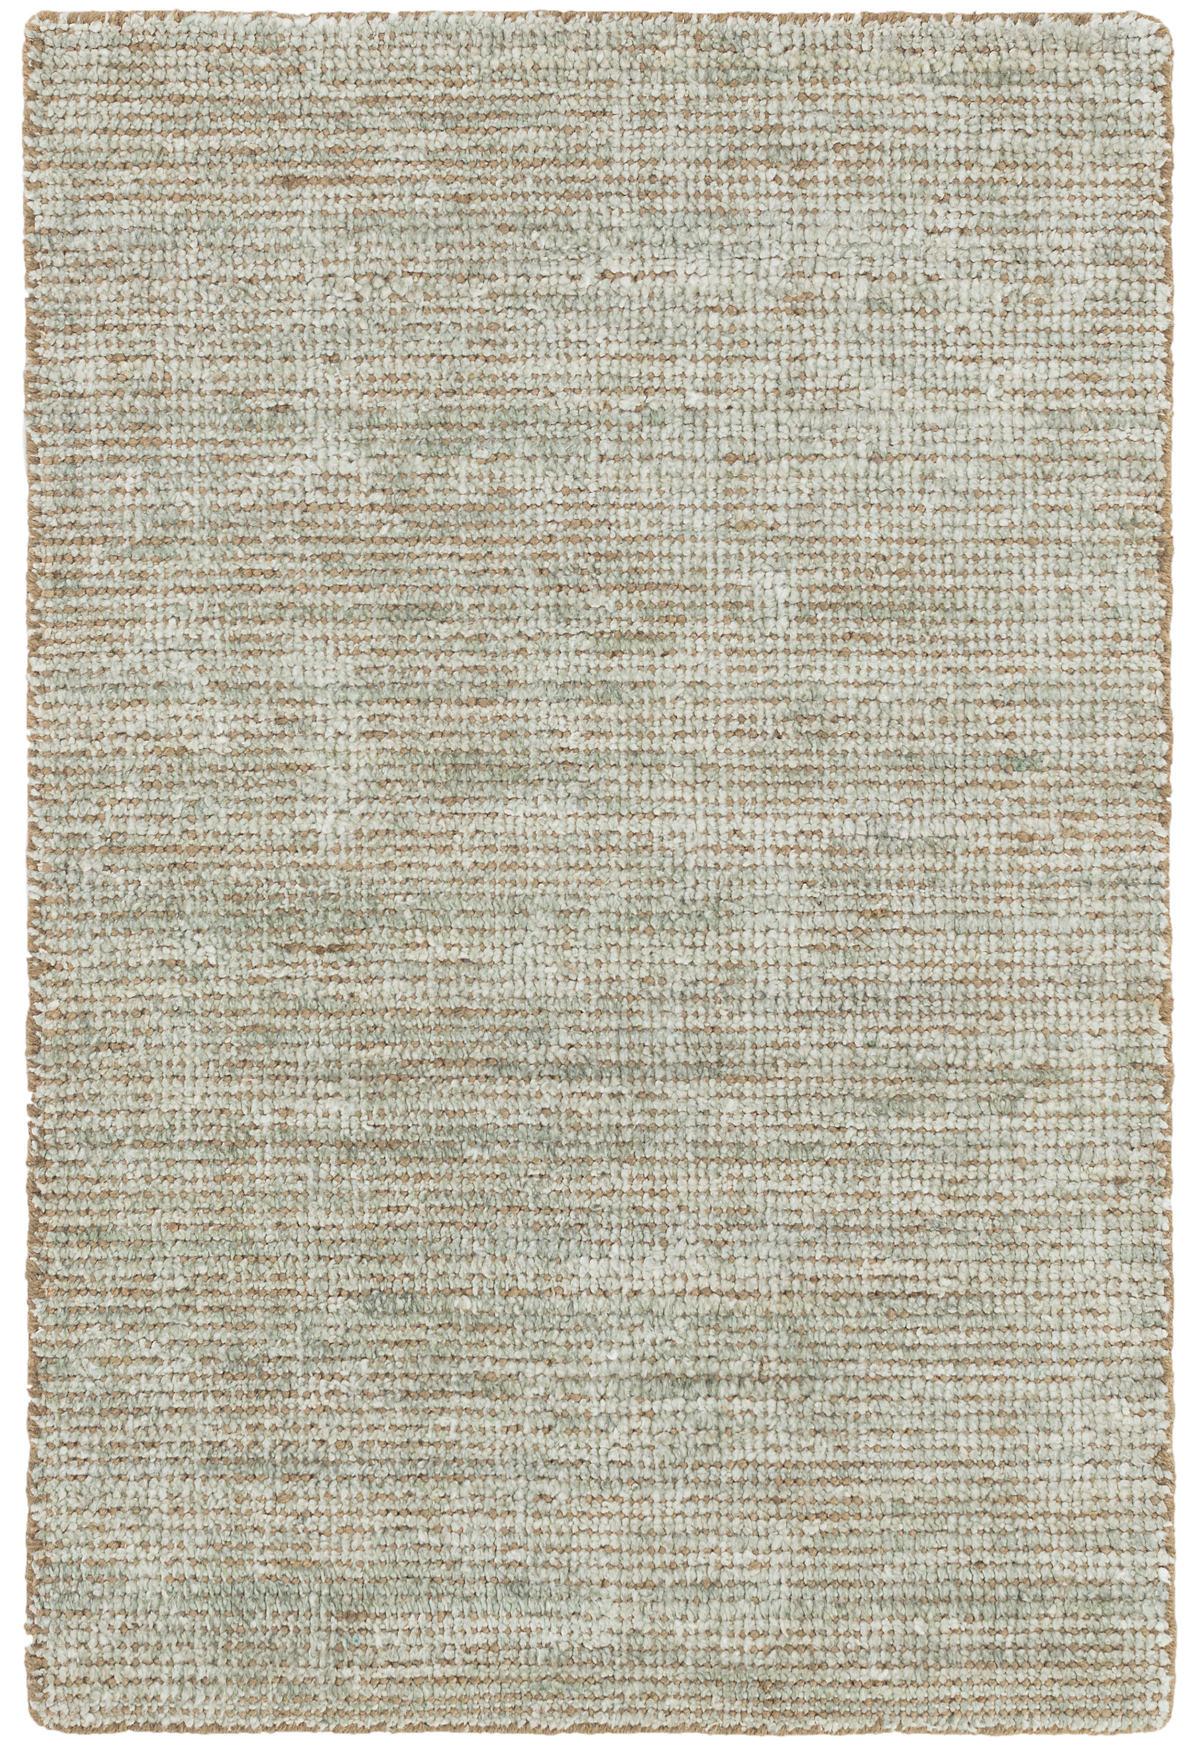 Reid Ocean Woven Viscose/Cotton Rug